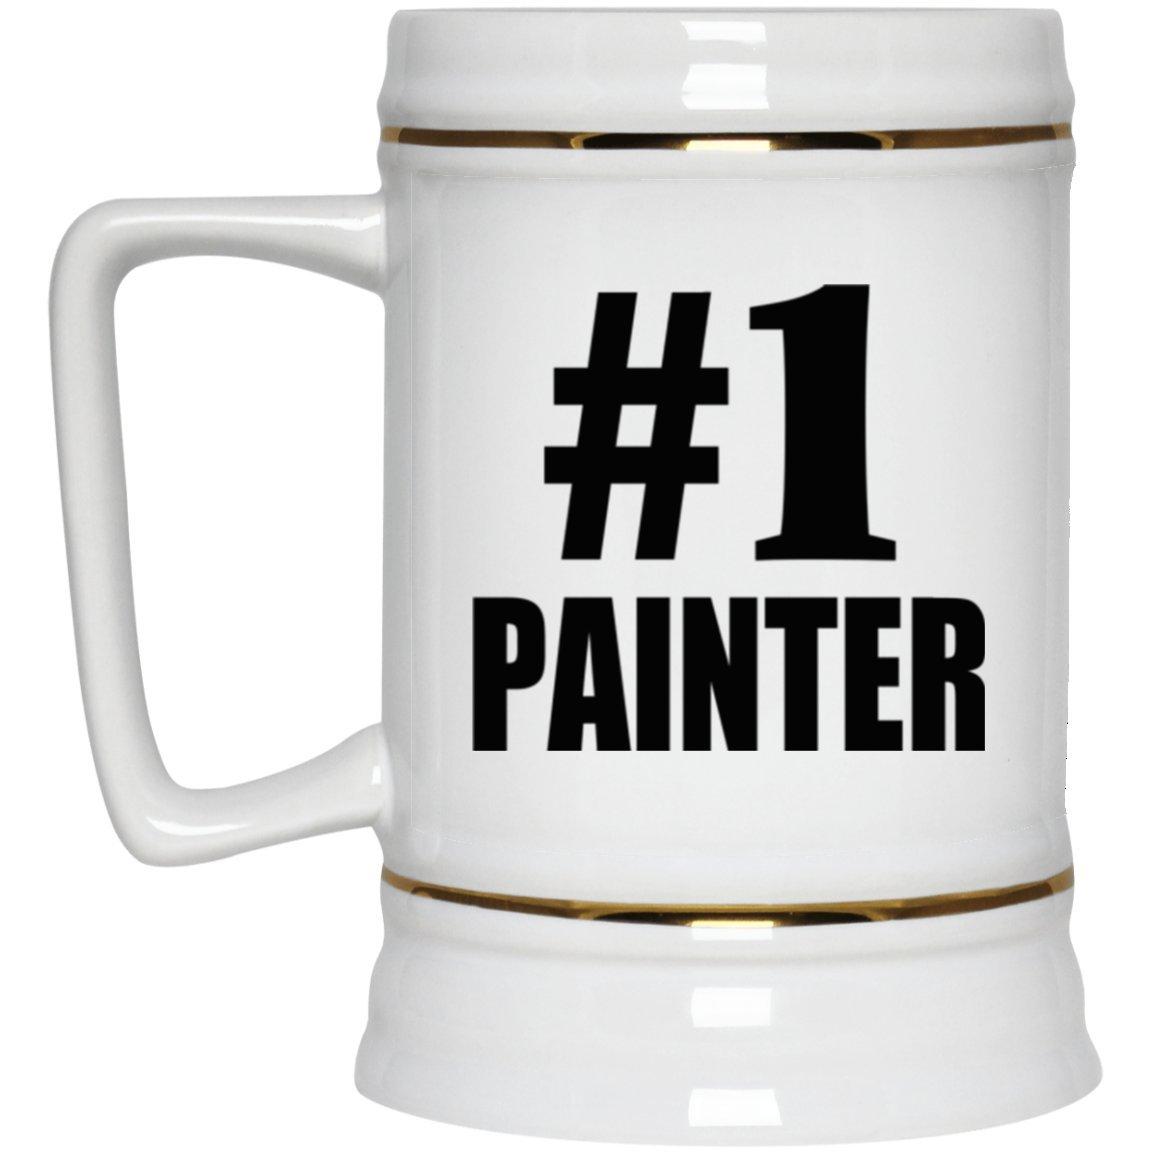 Number One #1 Painter - Beer Stein Ceramic Beer Tankard Bar Mug Handle Best Gift for Birthday, Wedding Anniversary, New Year, Valentine's Day, Easter, Mother's/Father's Day Valentine's Day Designsify